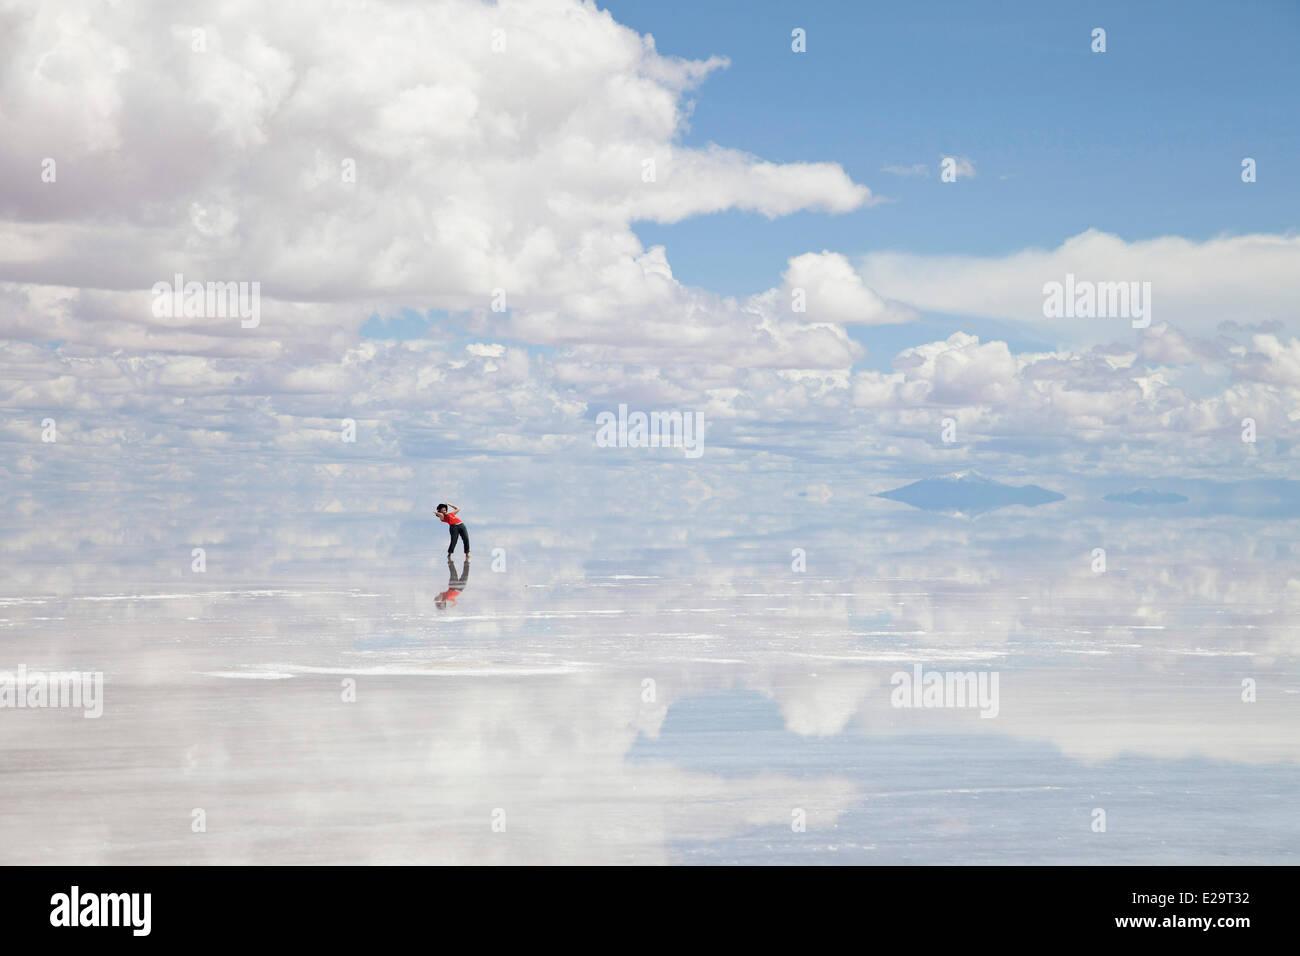 Bolivia, Potosi department, Salar de Uyuni the world's largest salt flat - Stock Image